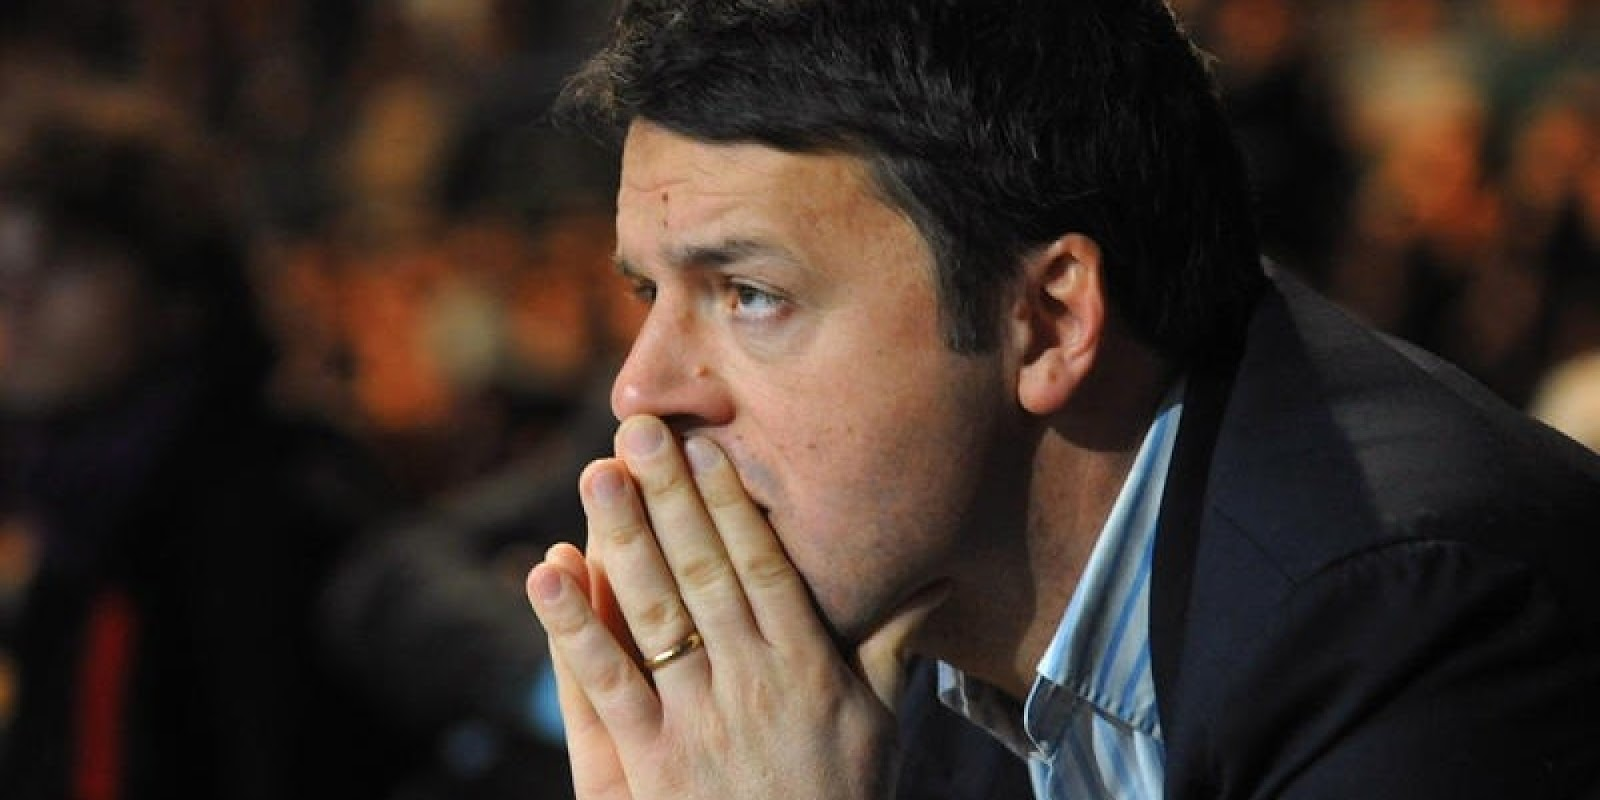 Matteo Renzi torna a casa e crolla…, si sfoga fra le lacrime